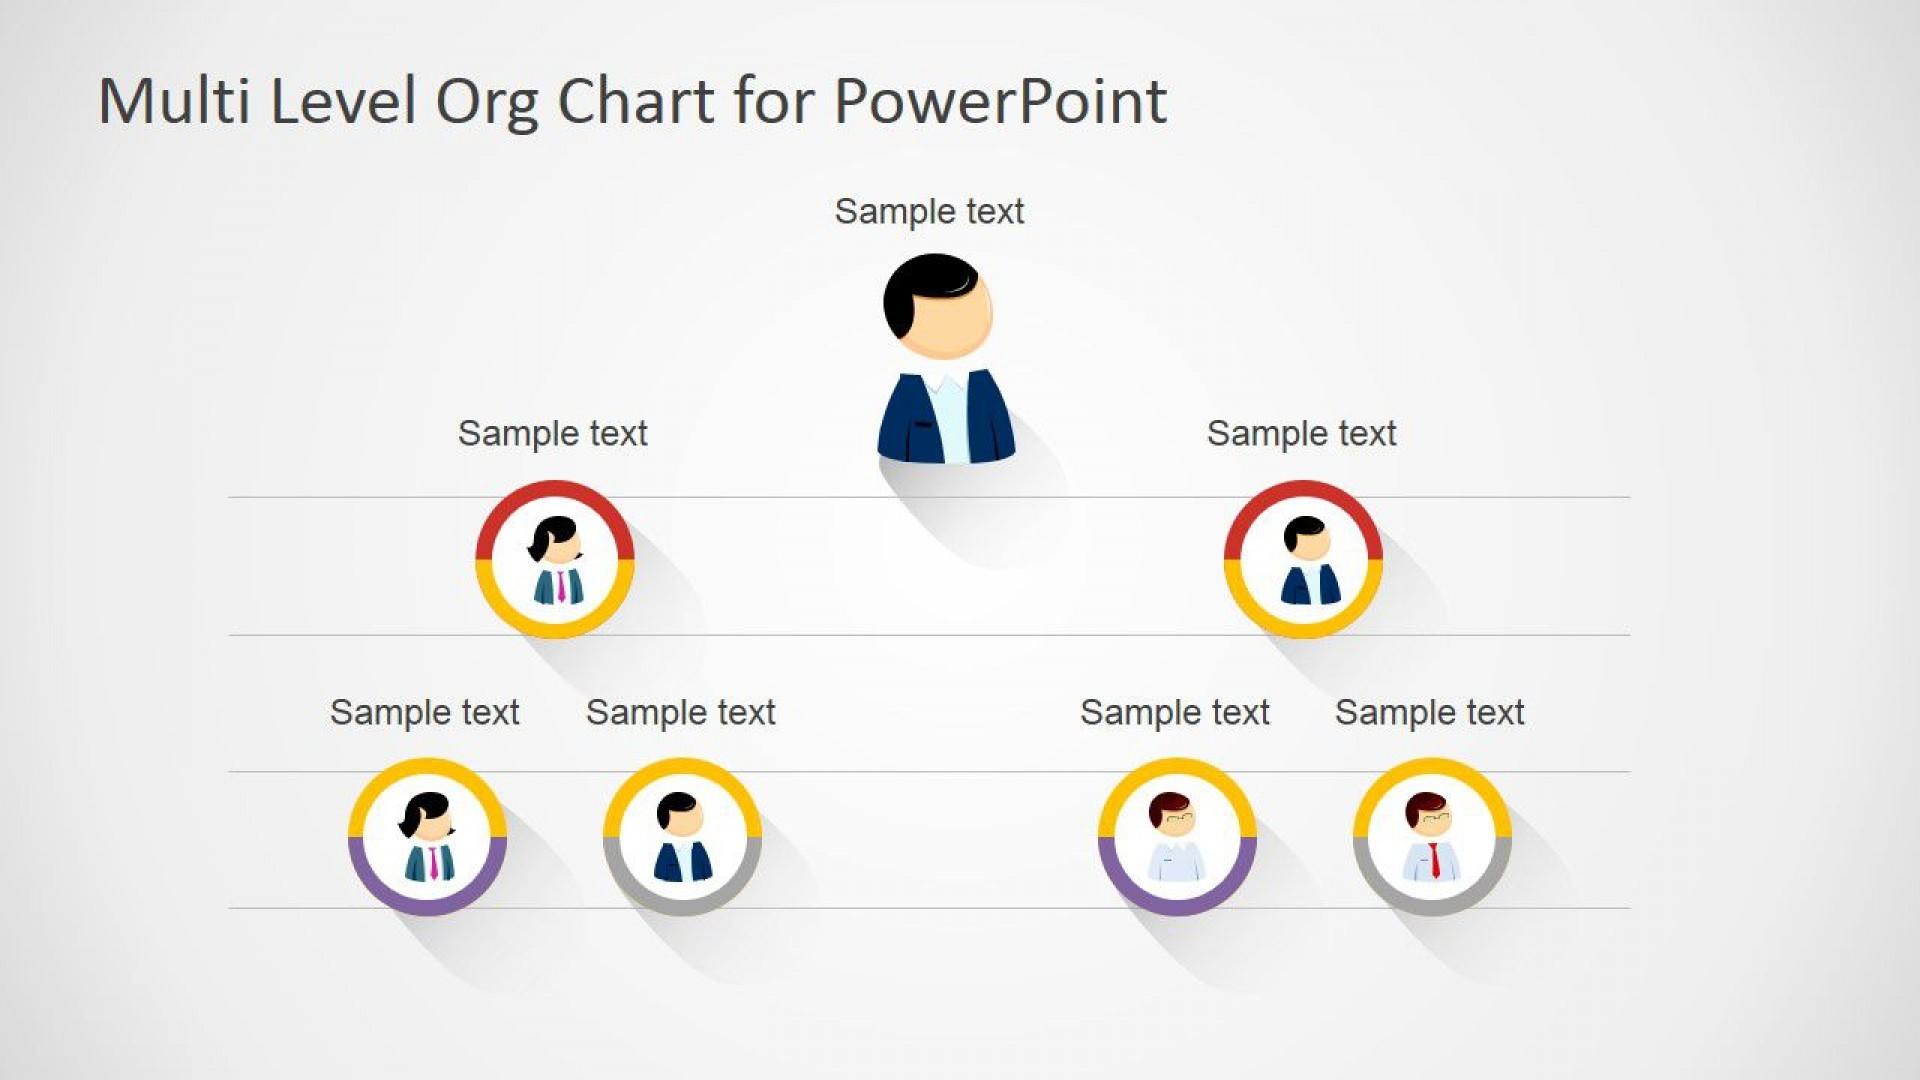 004 Stunning Organizational Chart Template Powerpoint Free Sample  Download 2010 Organization1920